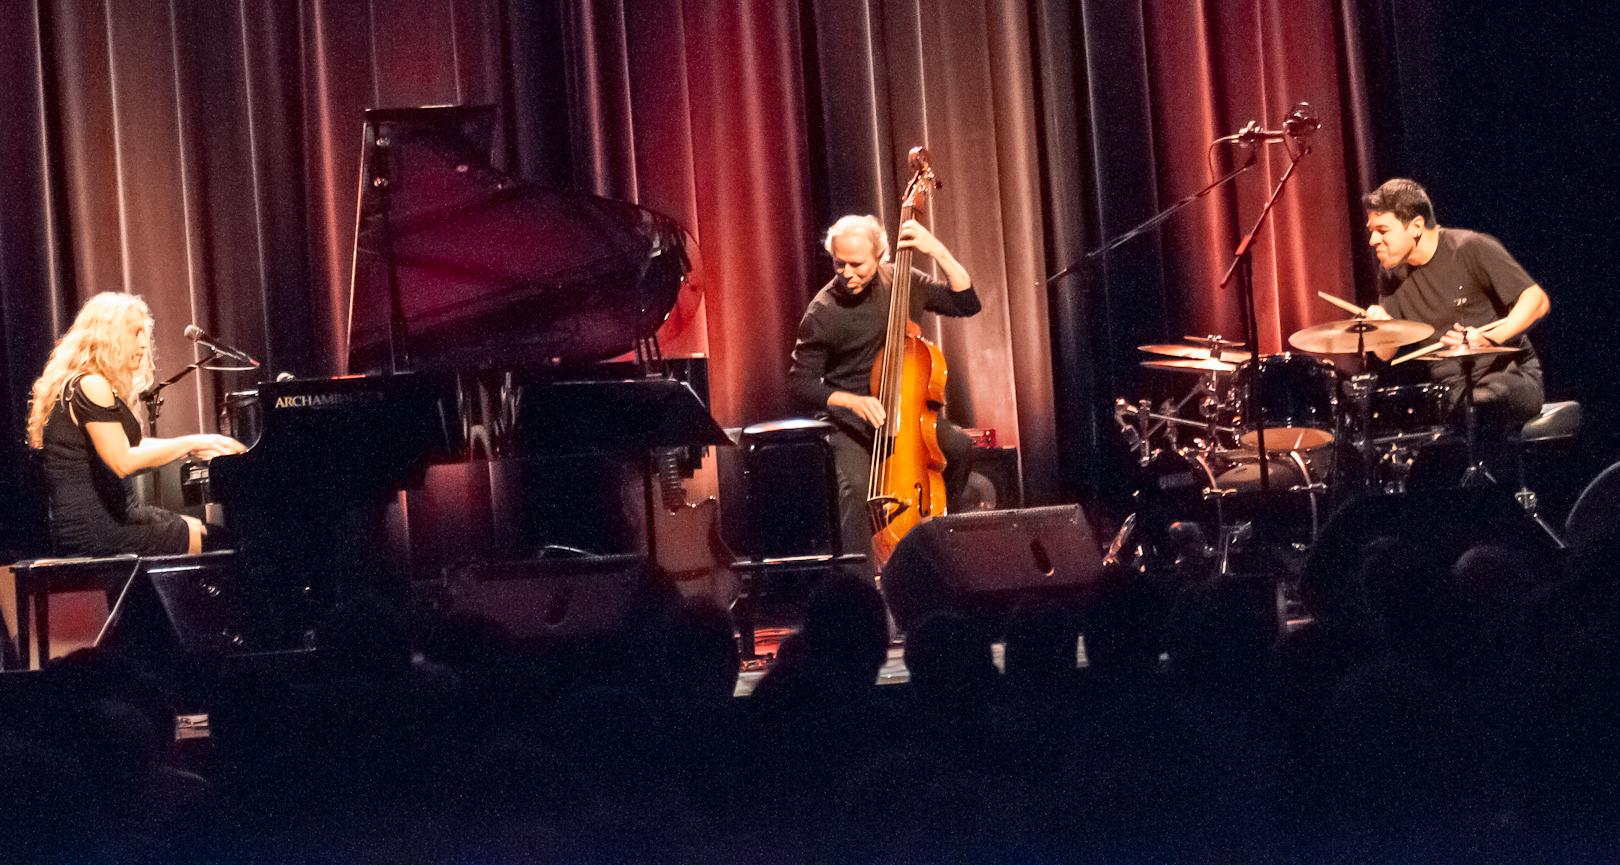 Eliane Elias Brasileira Quartet at the Montreal International Jazz Festival